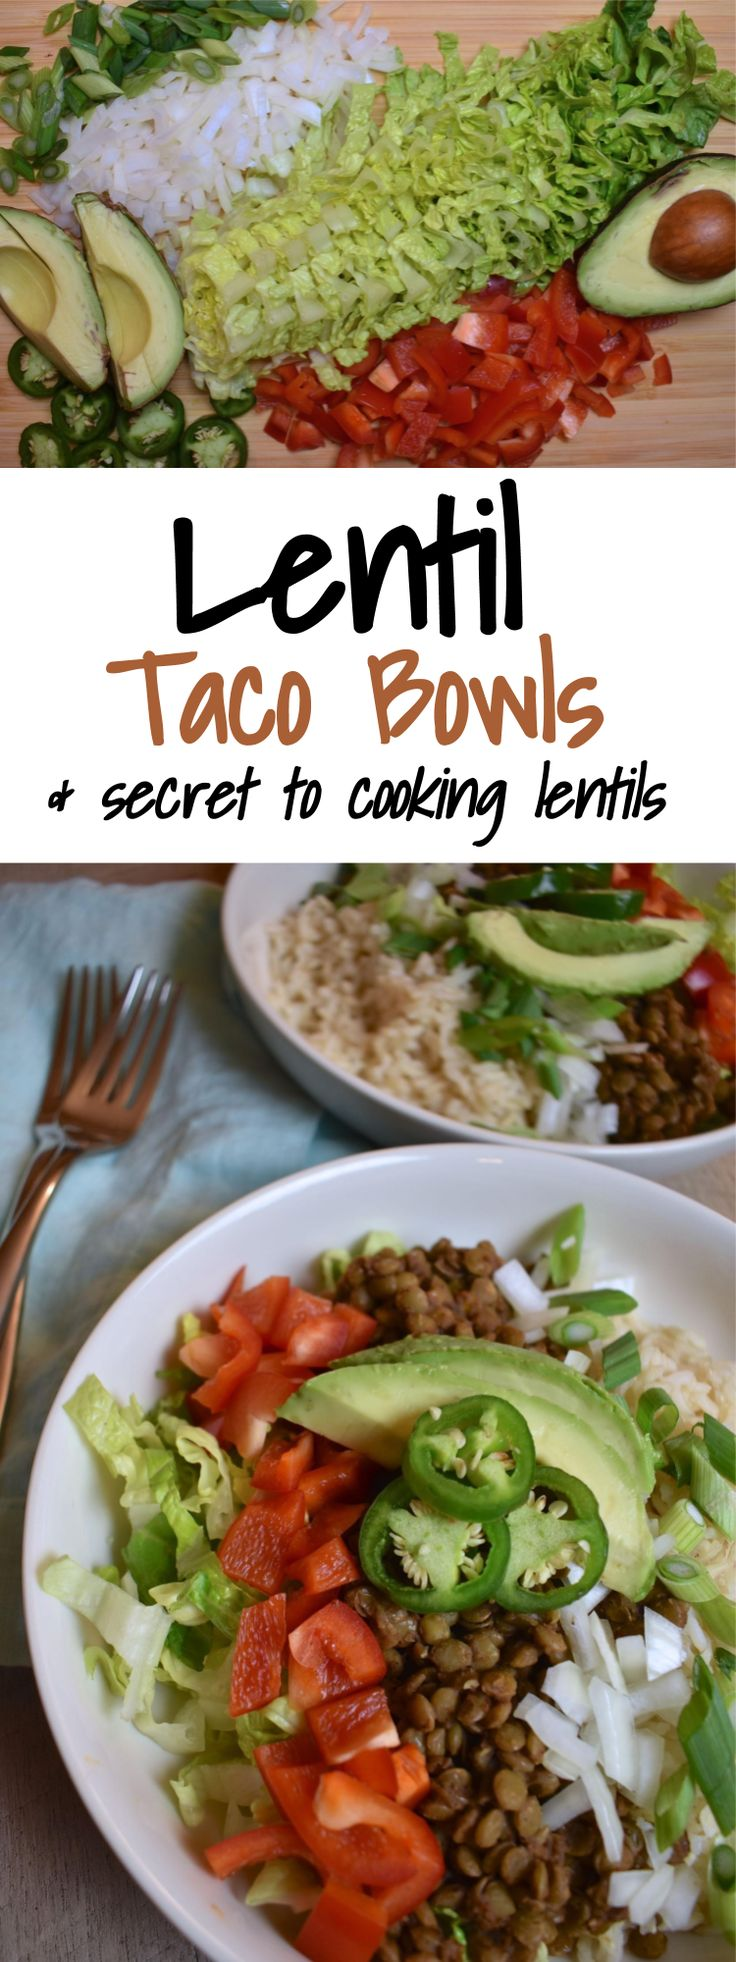 Lentil Taco Bowls | the secret to cooking lentils | how to cook lentils